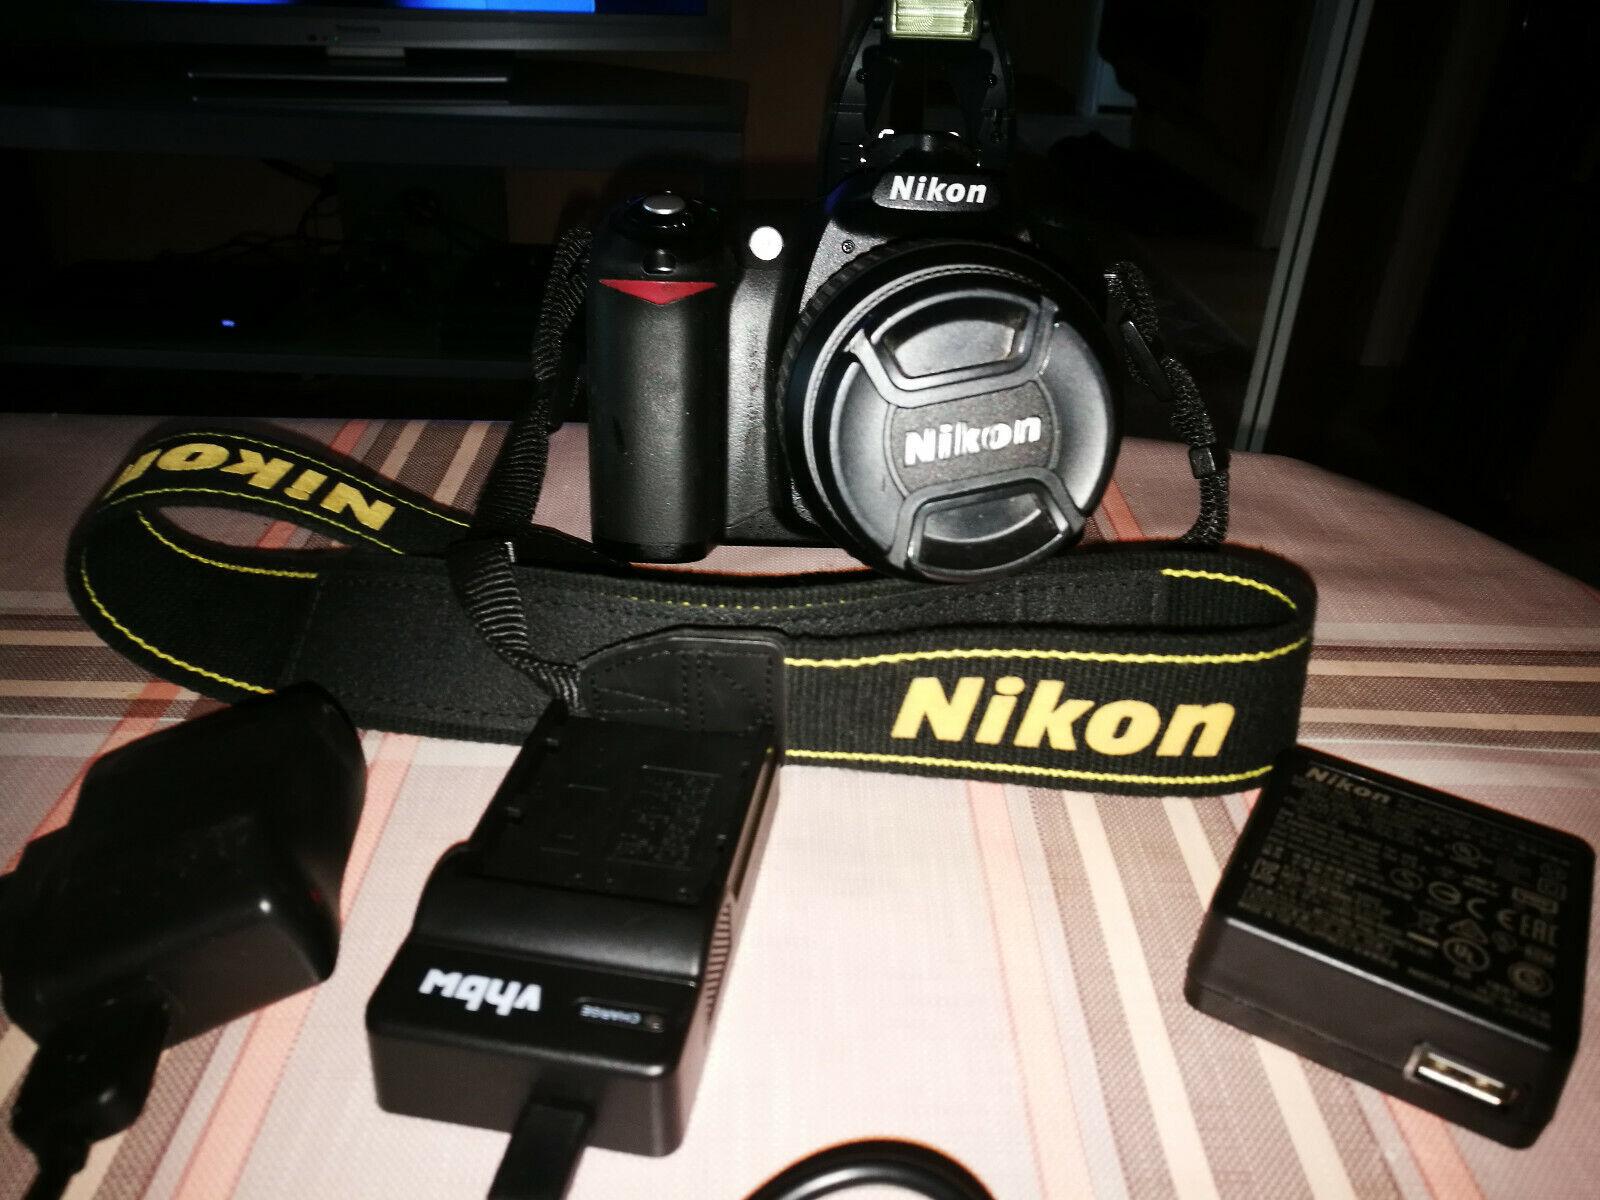 Nikon D50 Digitale Spiegel Reflex Kamera